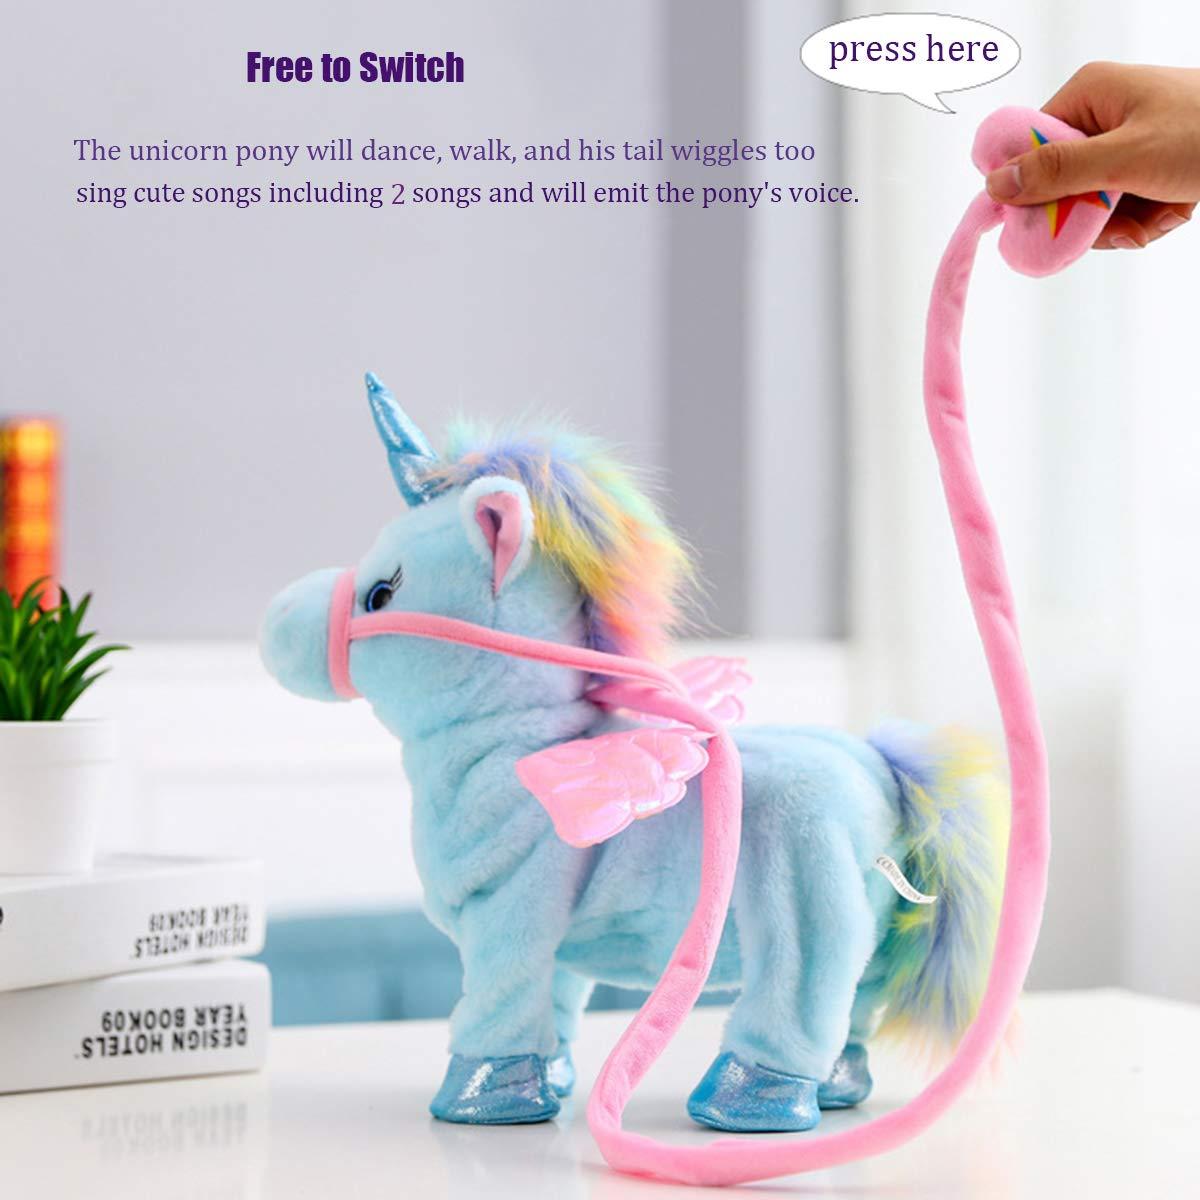 qiaoniuniu Electronic Pet Unicorn - Pink Small Pegasus - Stuffed Unicorn ,Singing Walking Musical Cute Plush Toys for Toddlers Girls Boys,Kids & Pets Birthday by qiaoniuniu (Image #4)